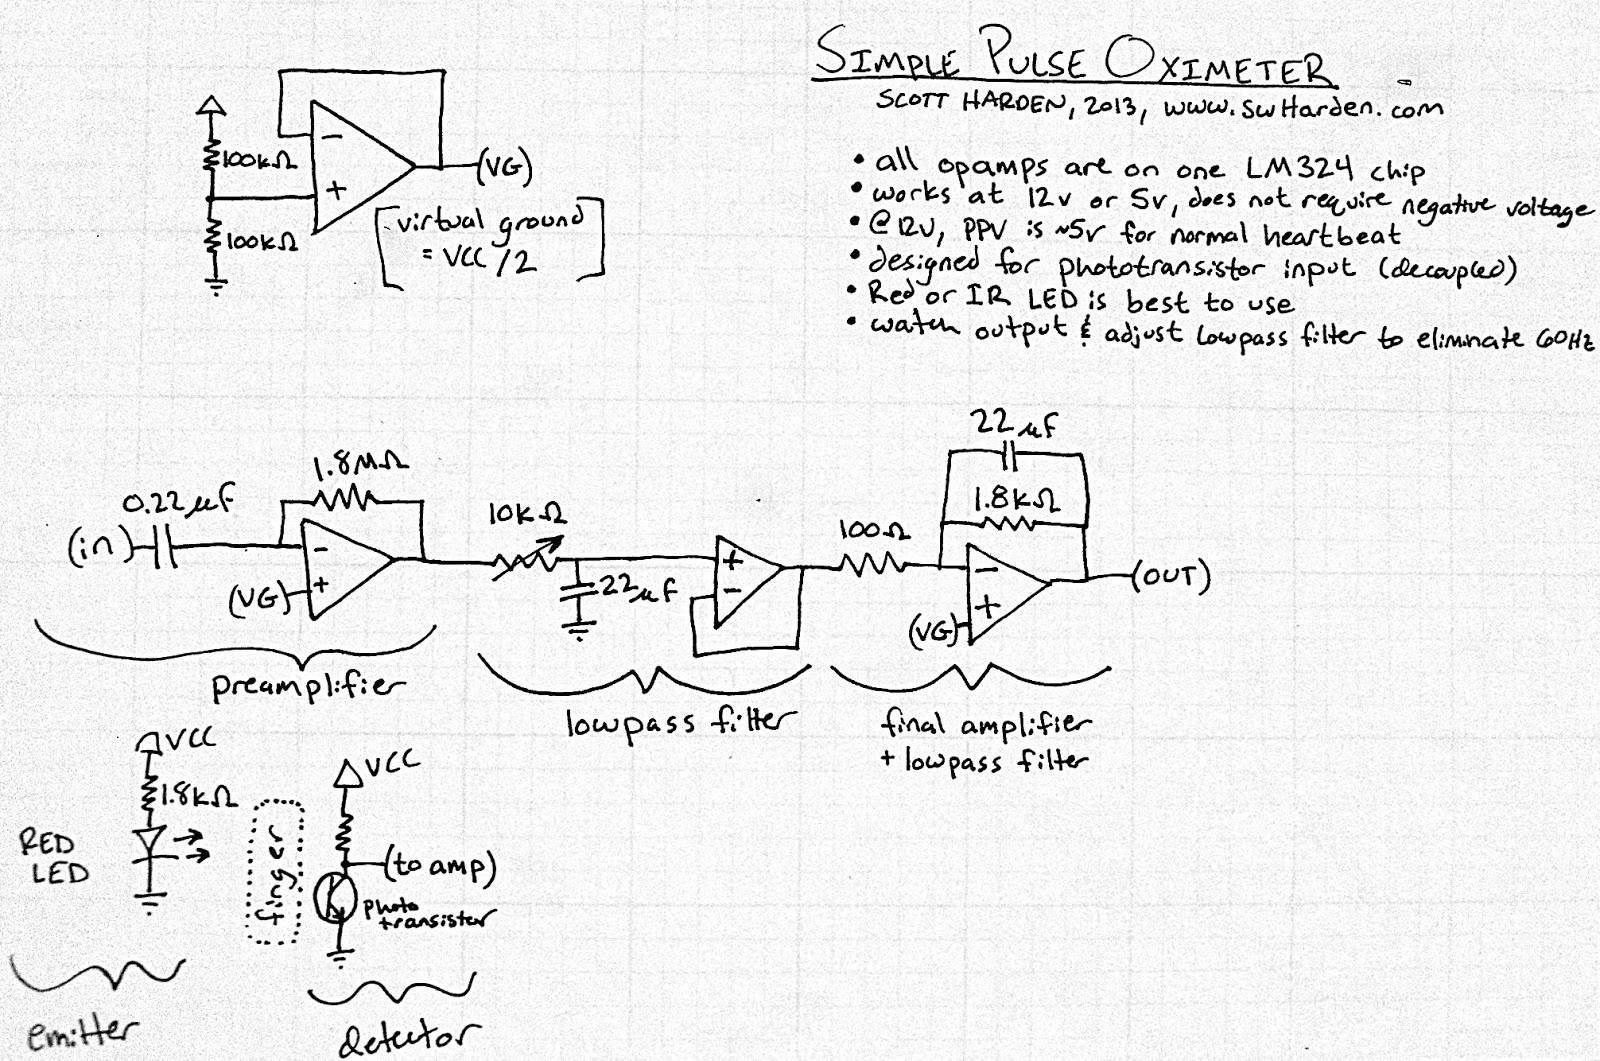 medium resolution of simple pulse oximeter circuit diagram electronic circuits diagram simple pulse oximeter circuit diagram